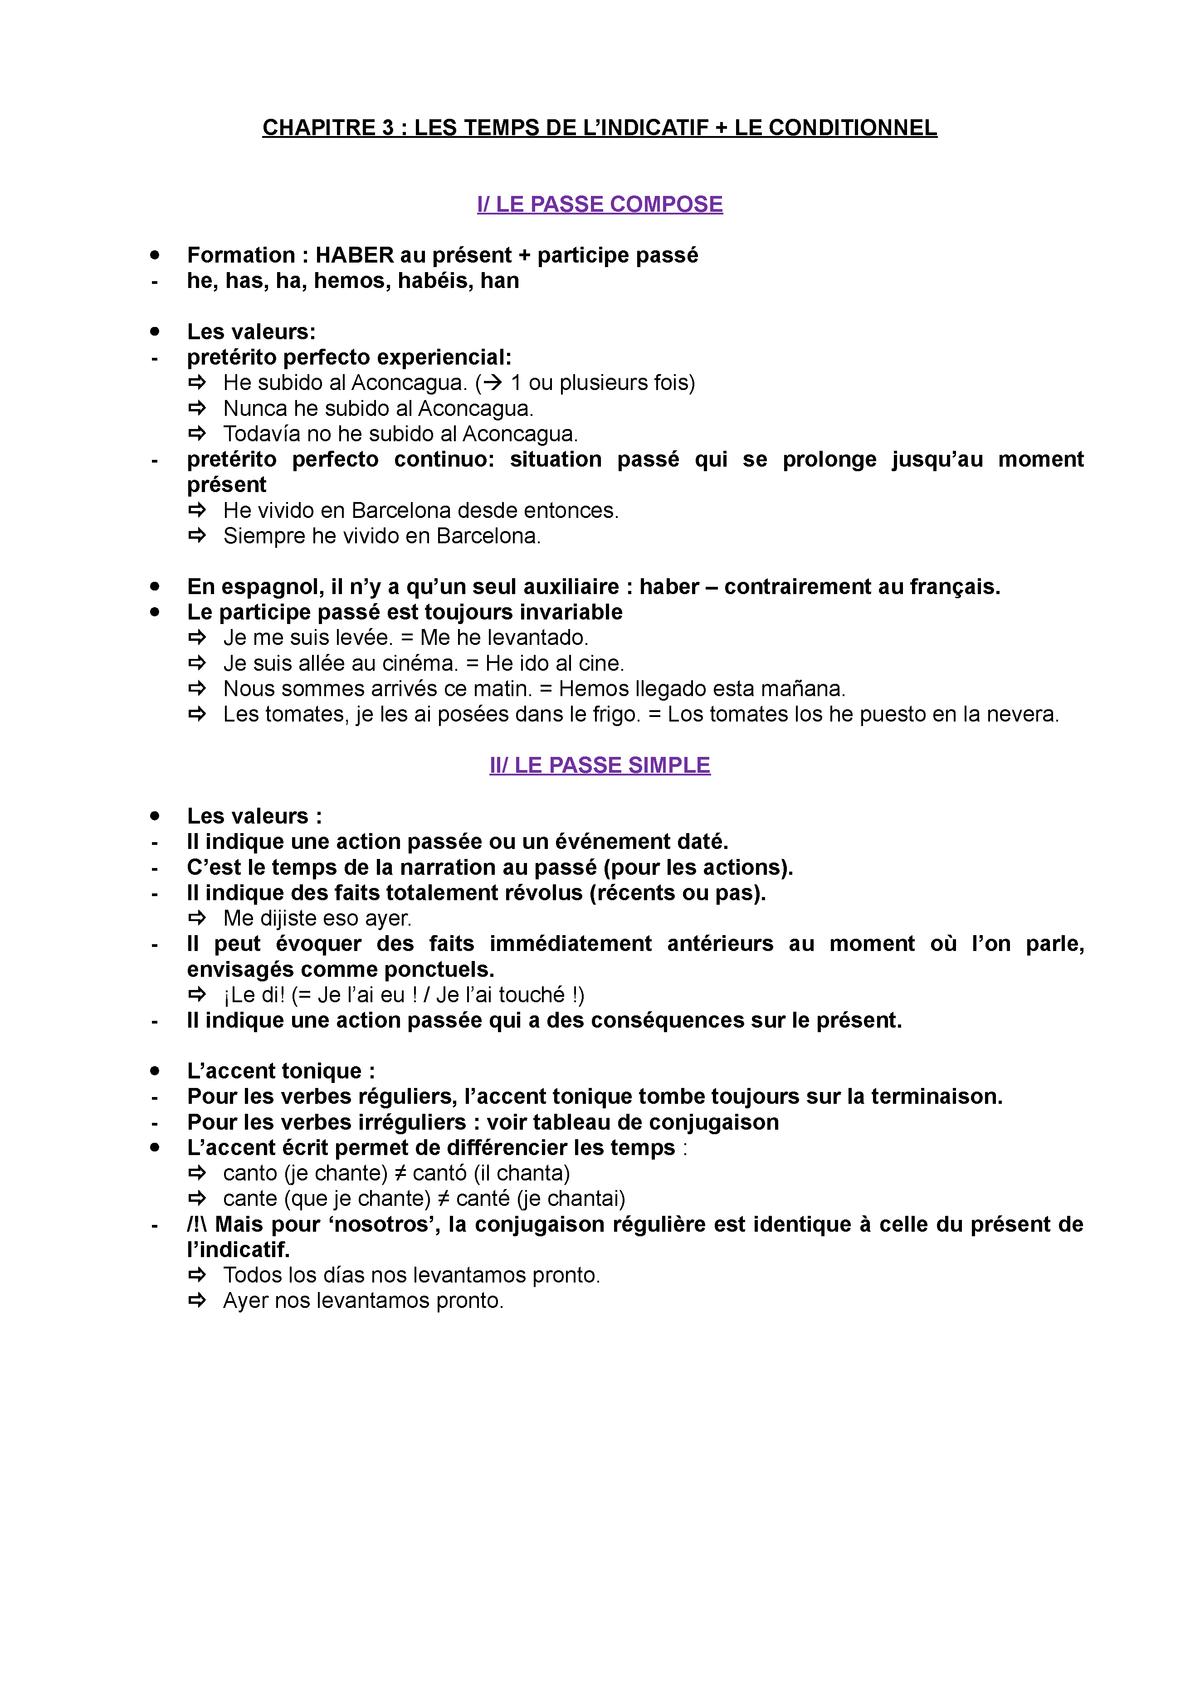 Grammaire Espagnole Fiche 3 Studocu